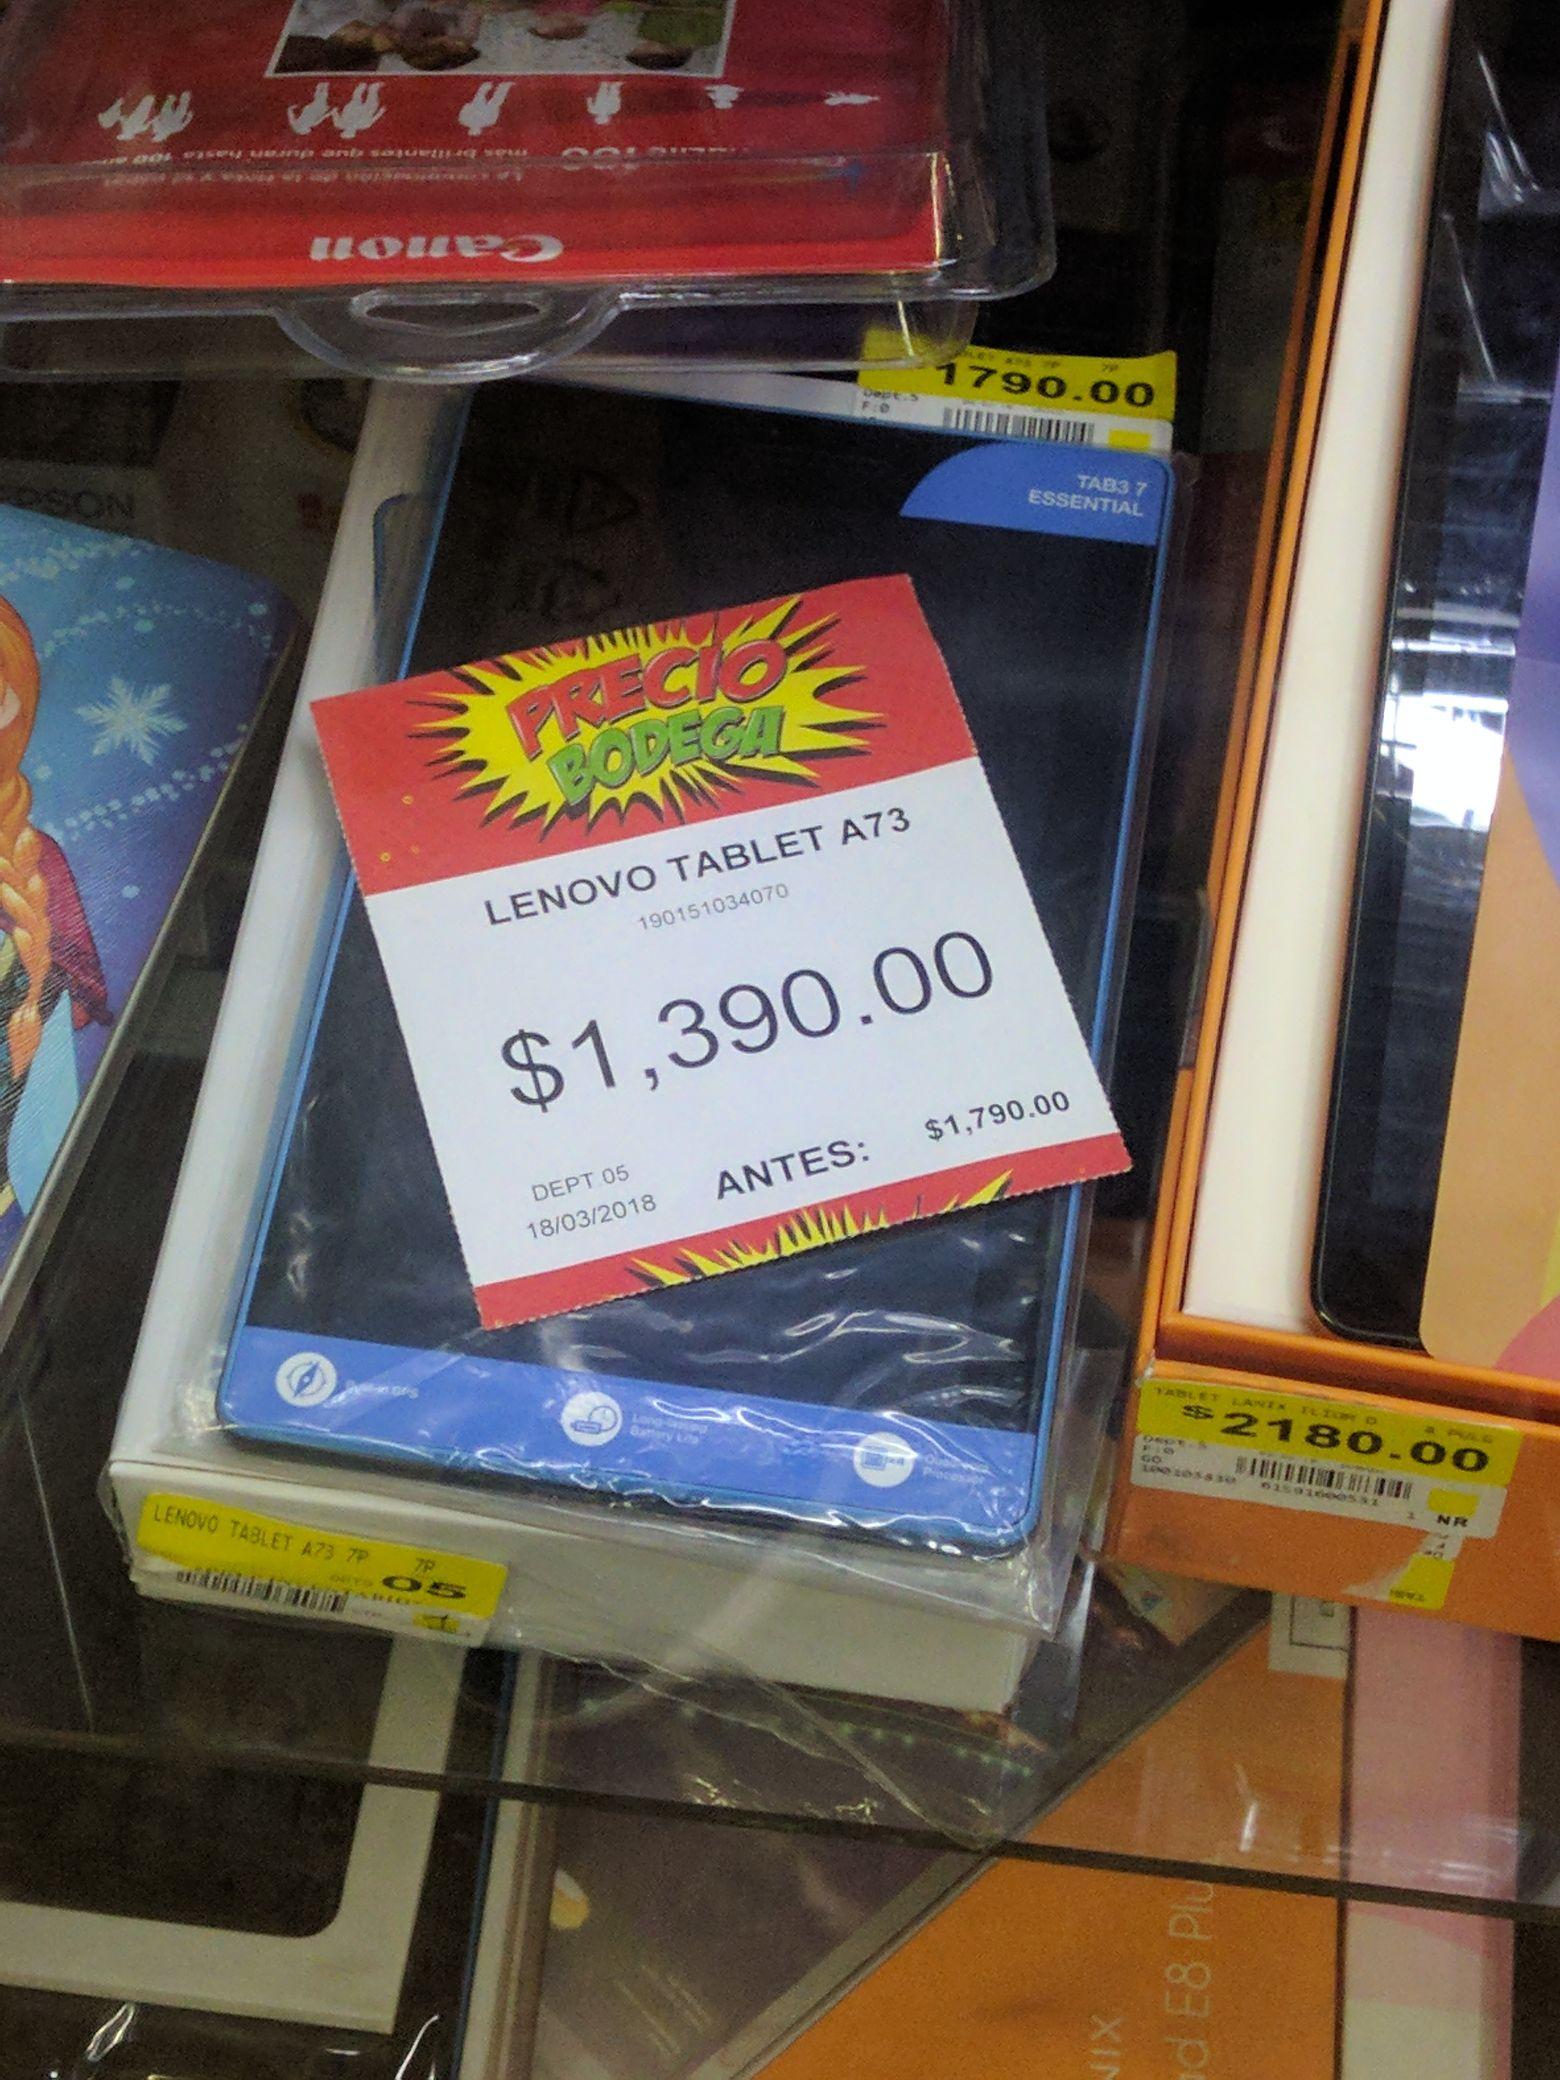 Bodega Aurrerá: Tablet Lenovo A7 a $1,390